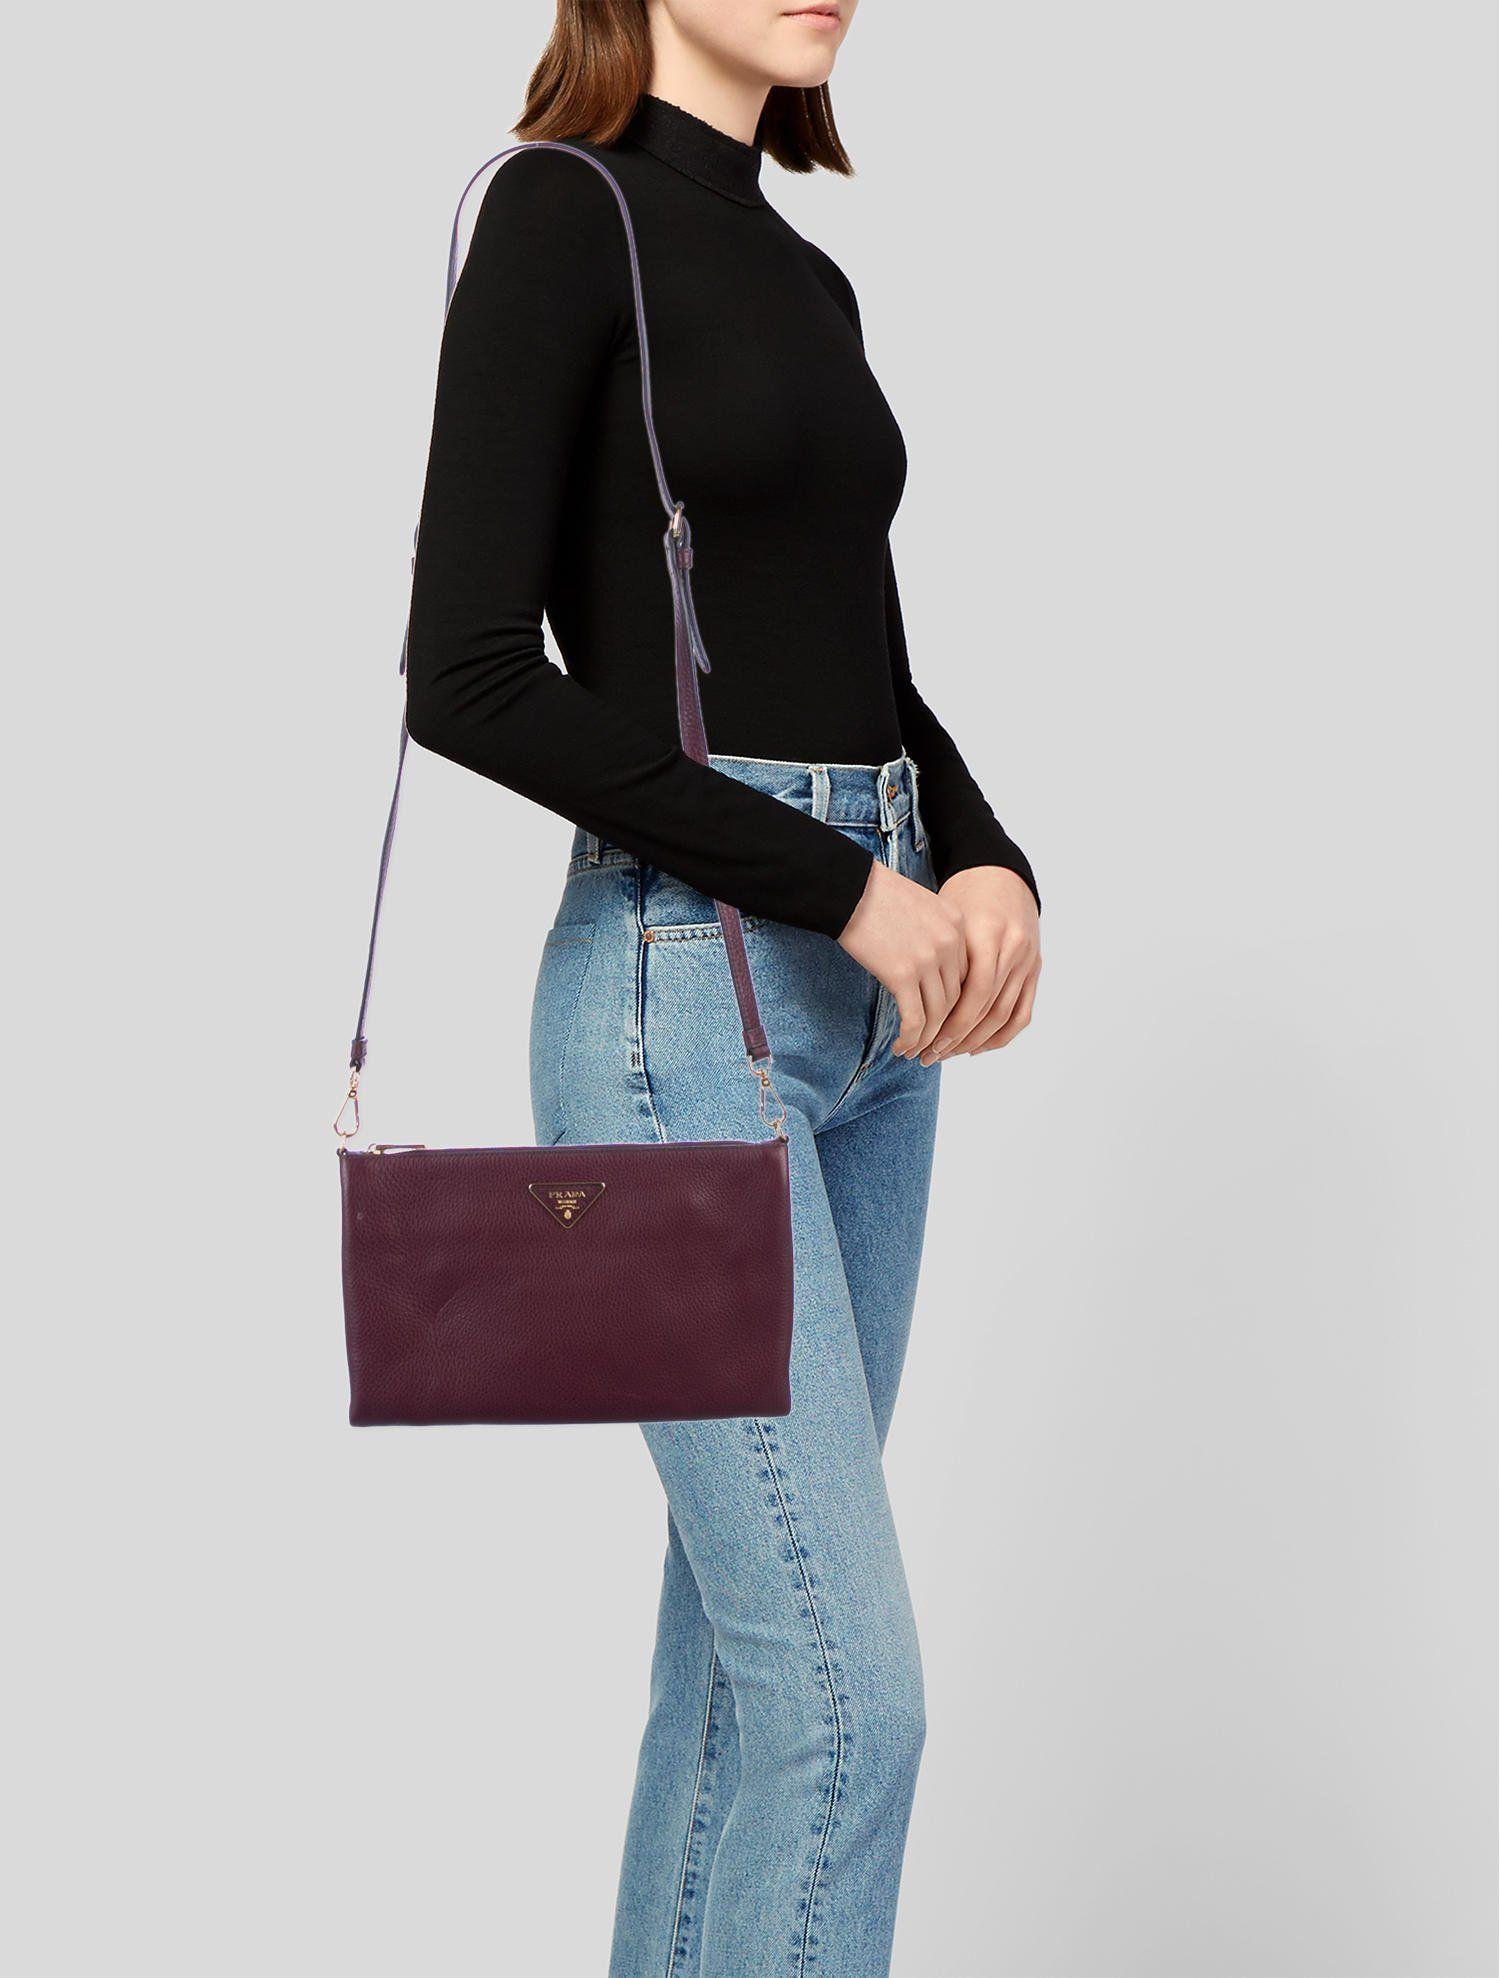 9751e83d3c Prada Vitello Daino Phenix Crossbody Bag - Handbags - PRA250923